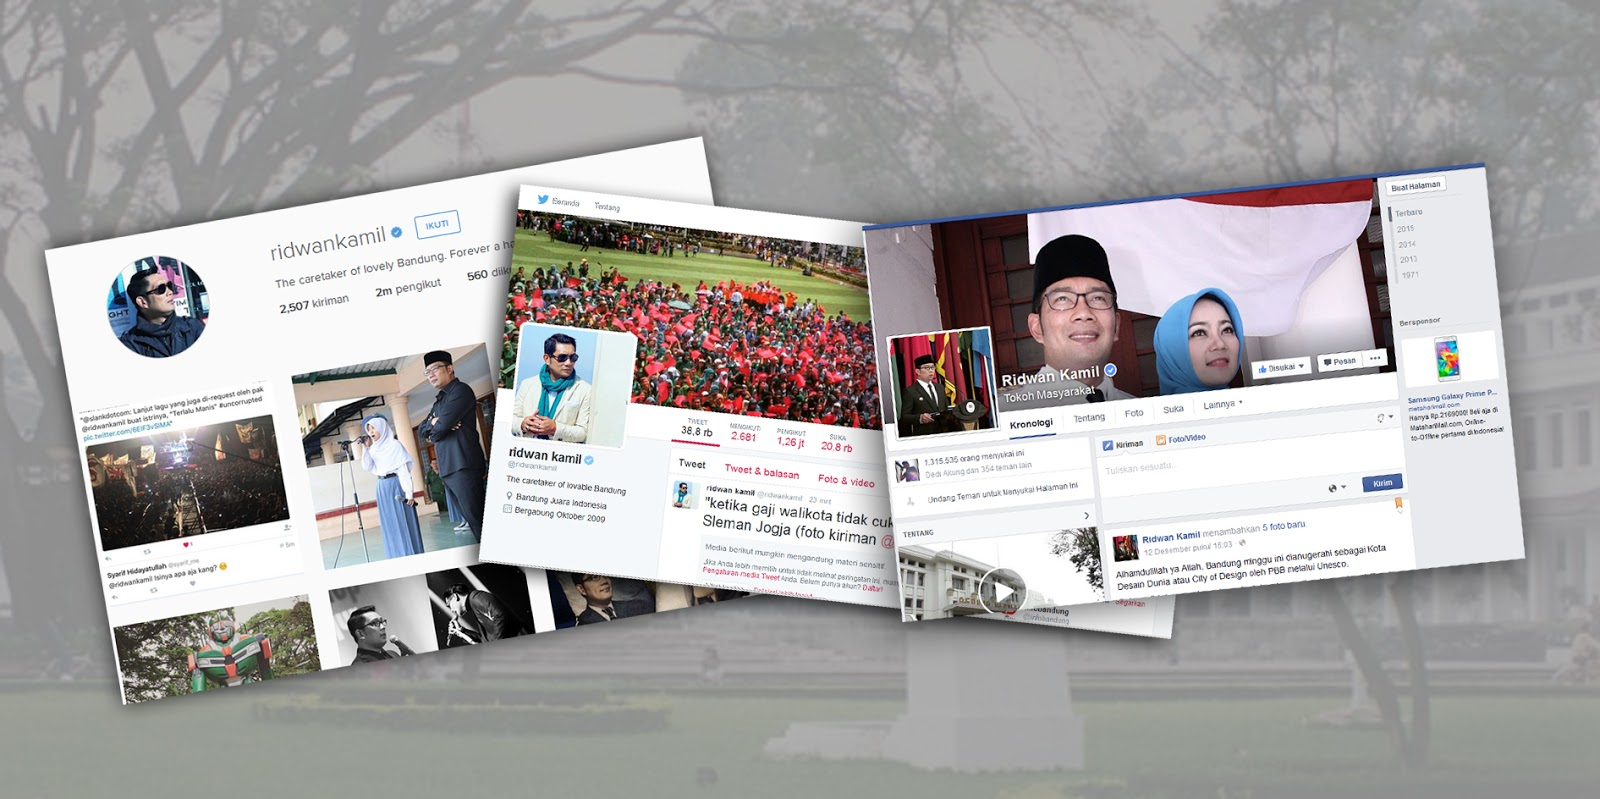 Humor Wali Kota Bandung, Ridwan Kamil di akun media sosial